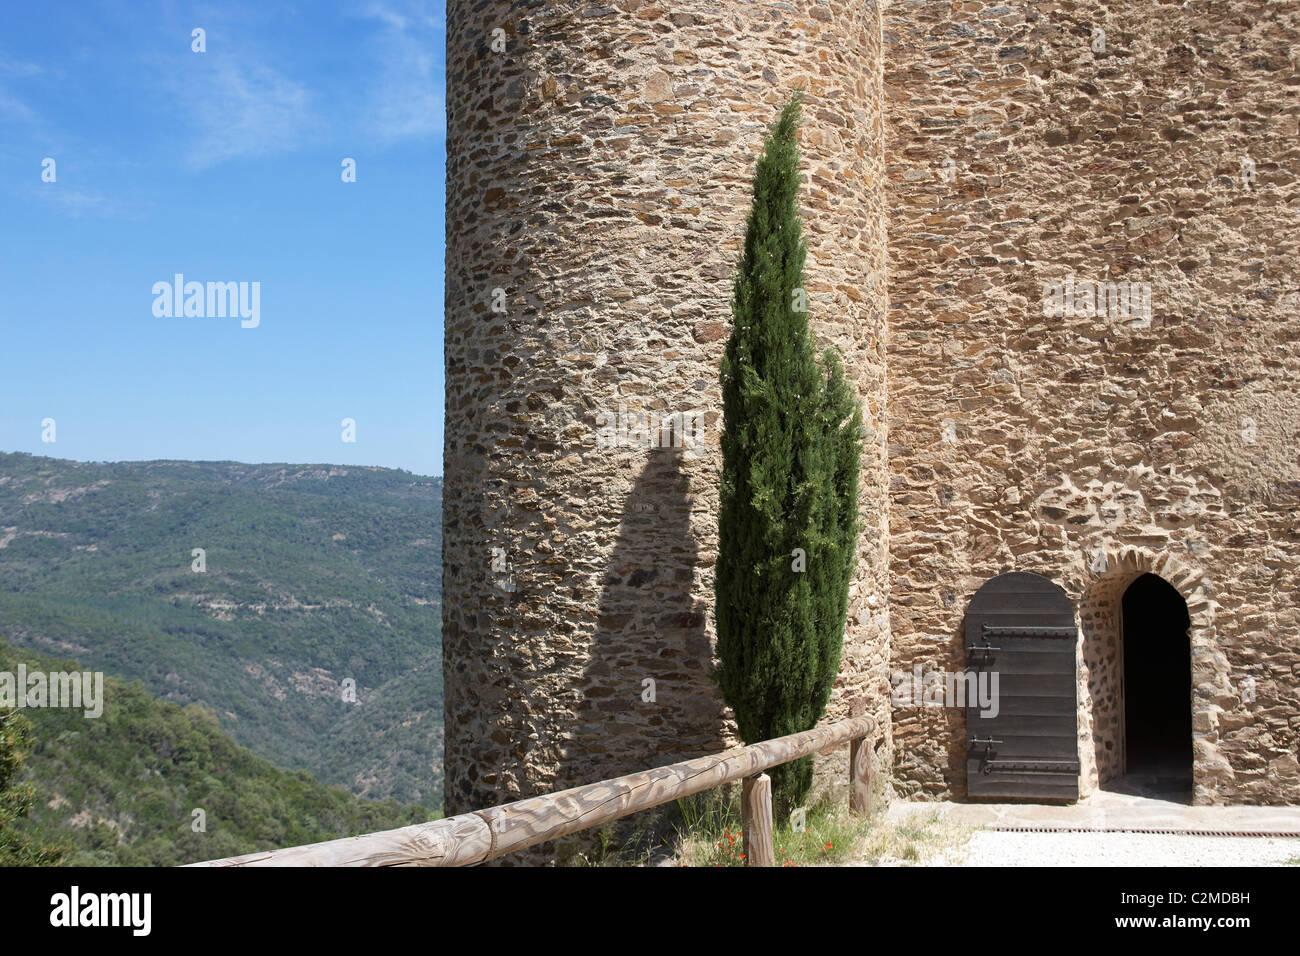 Chartreuse de la Verne, Provence, France. - Stock Image